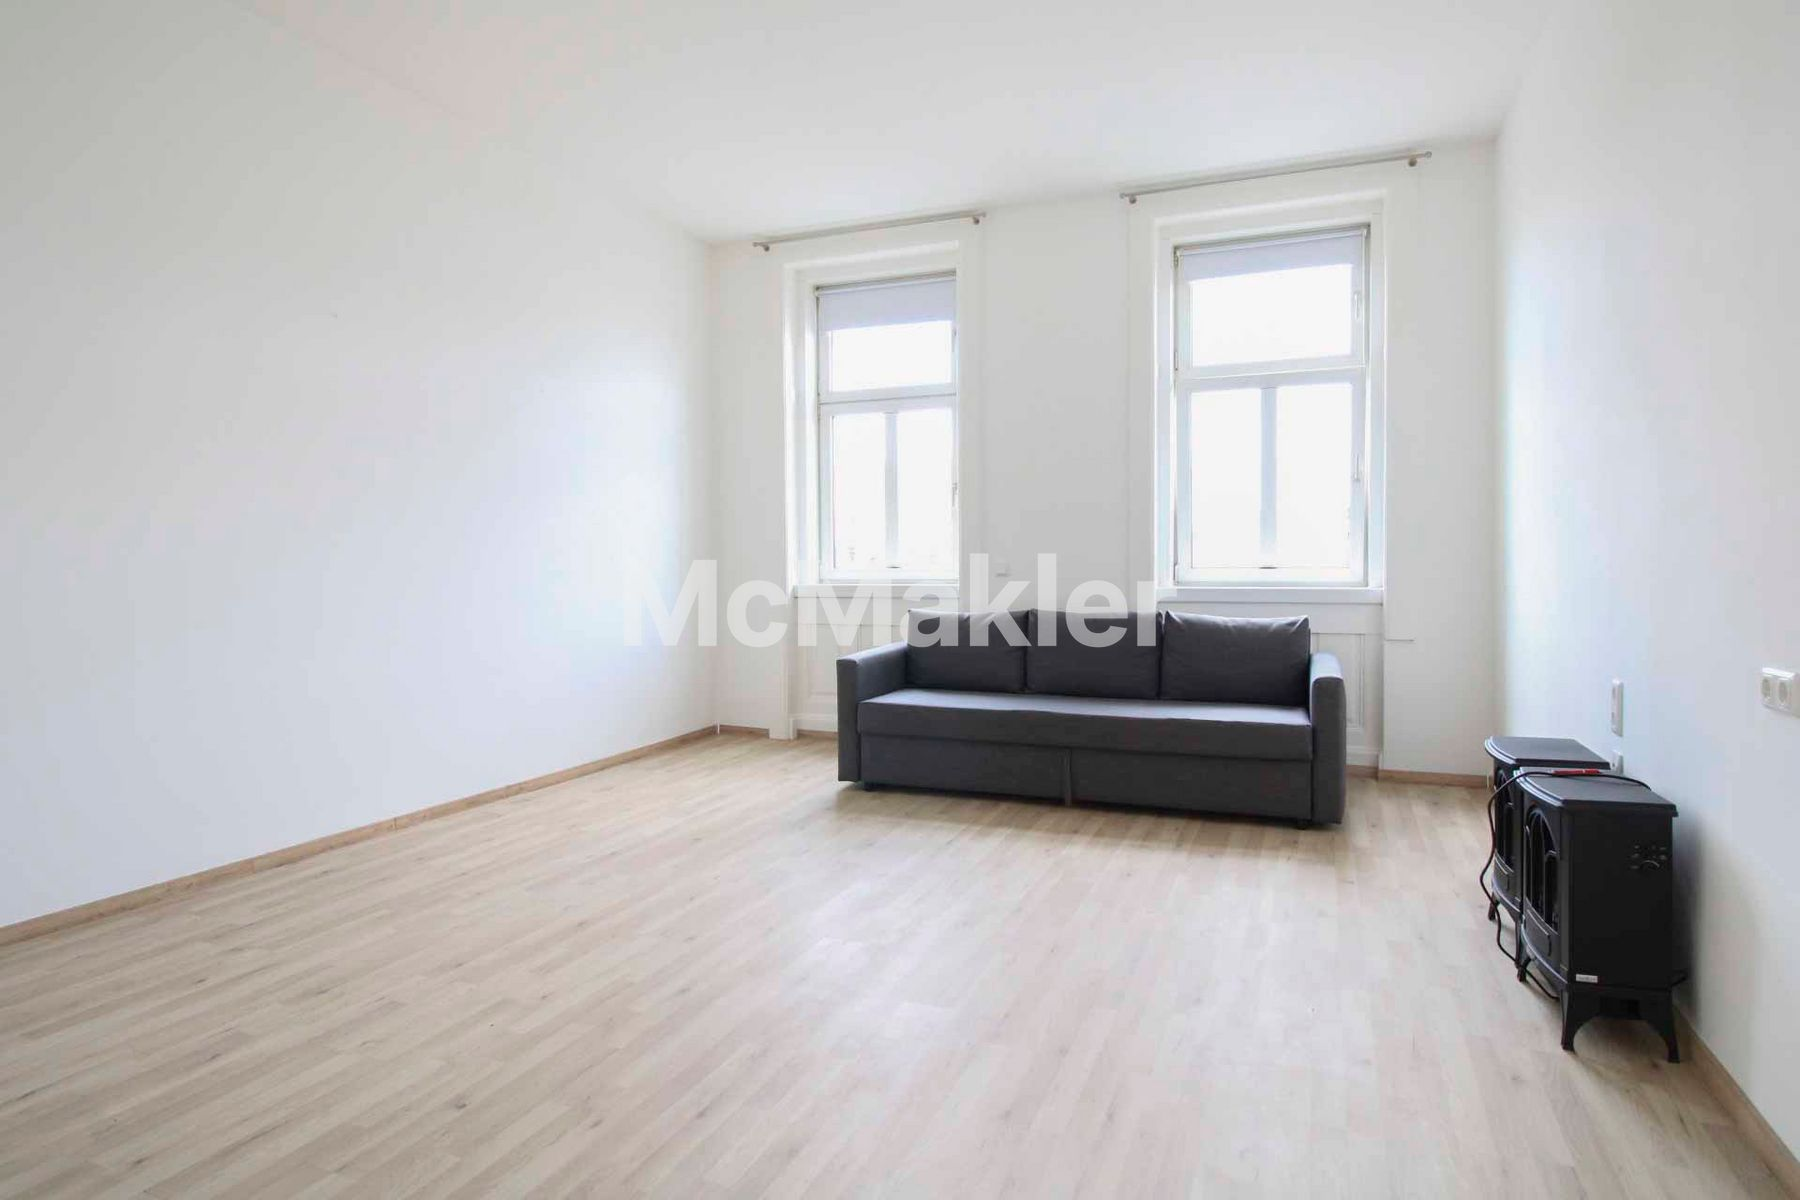 Property view 0